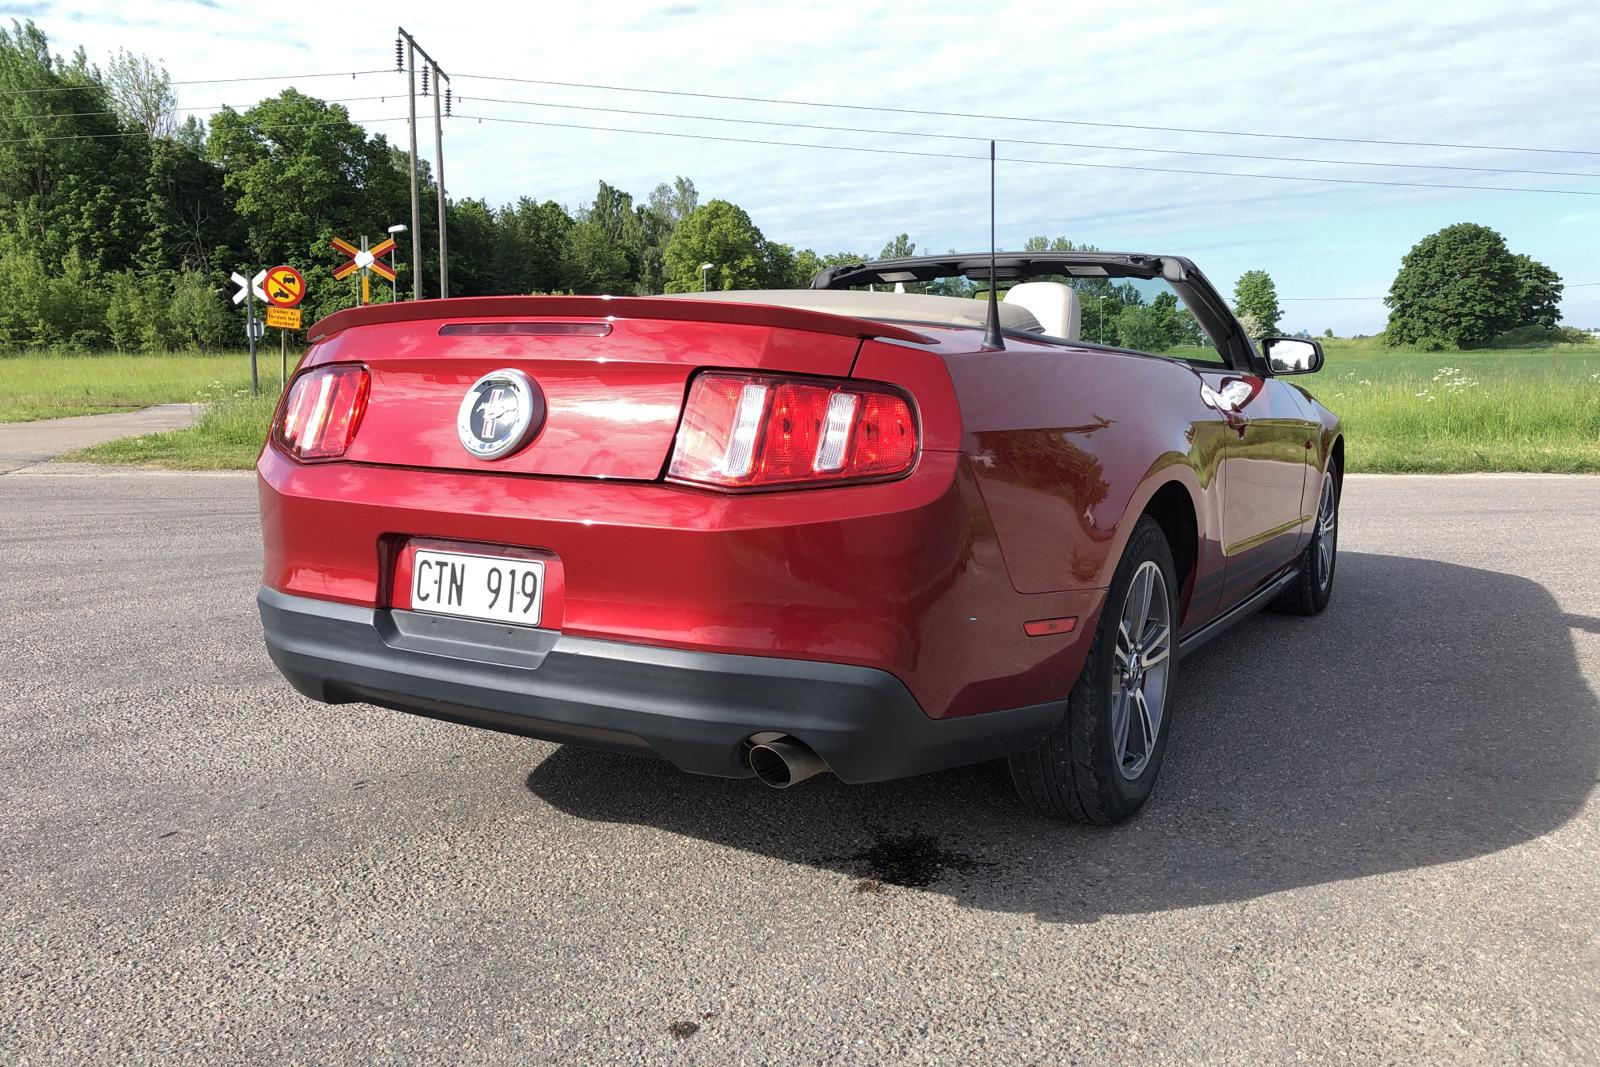 Ford Mustang 4.0 V6 Cabriolet (210hk) - 5 819 mil - Automat - Dark Red - 2010